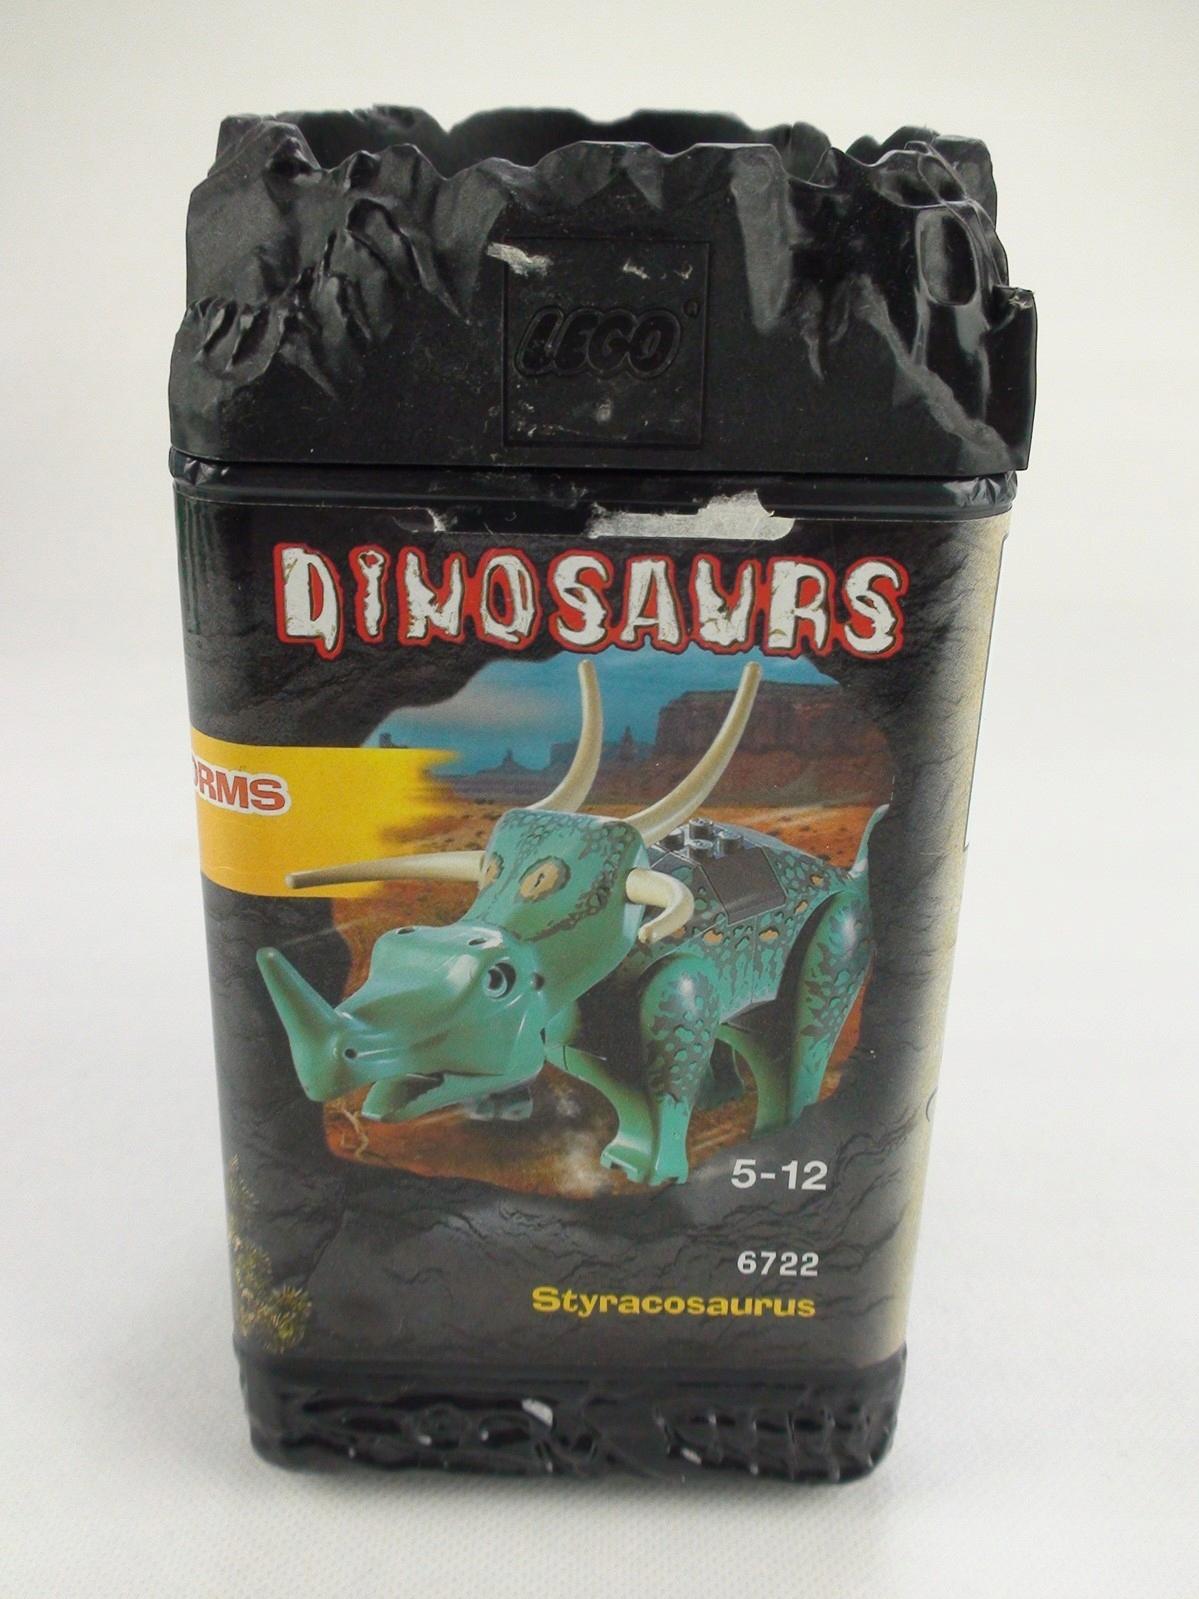 Lego Dinosaurs 6722